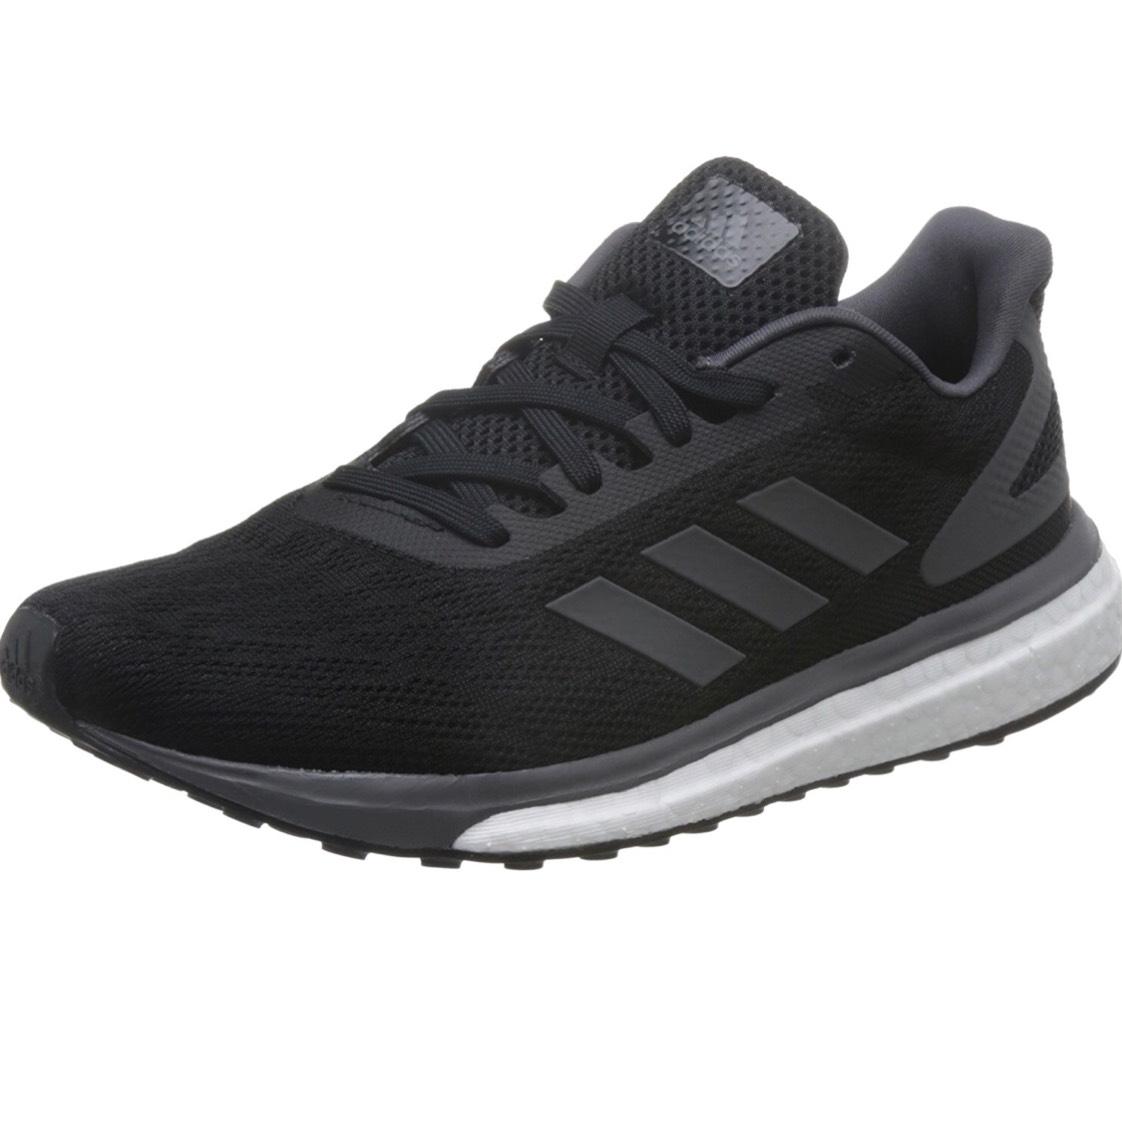 Zapatillas Adidas Response Lite